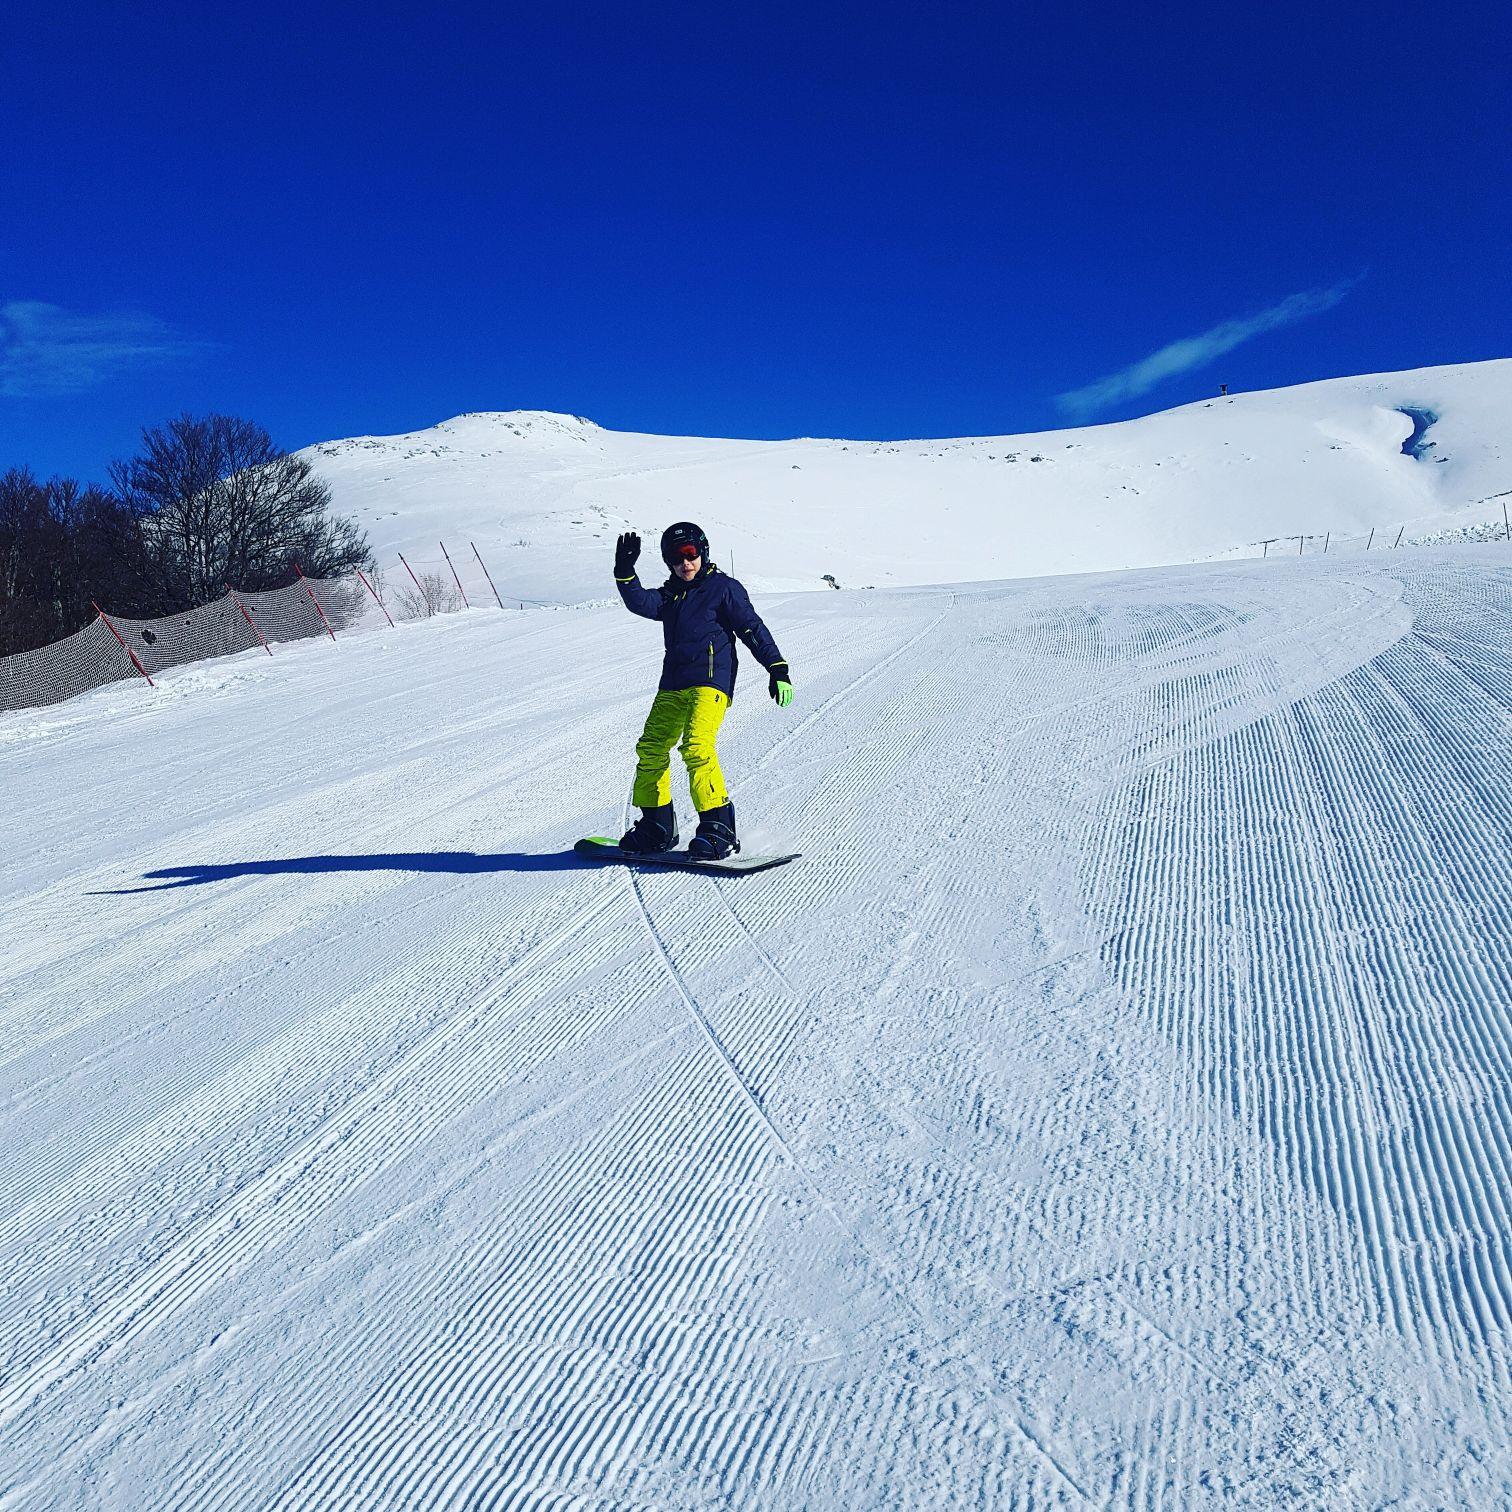 evolutionski-pescasseroli snowboard-abruzzo-2